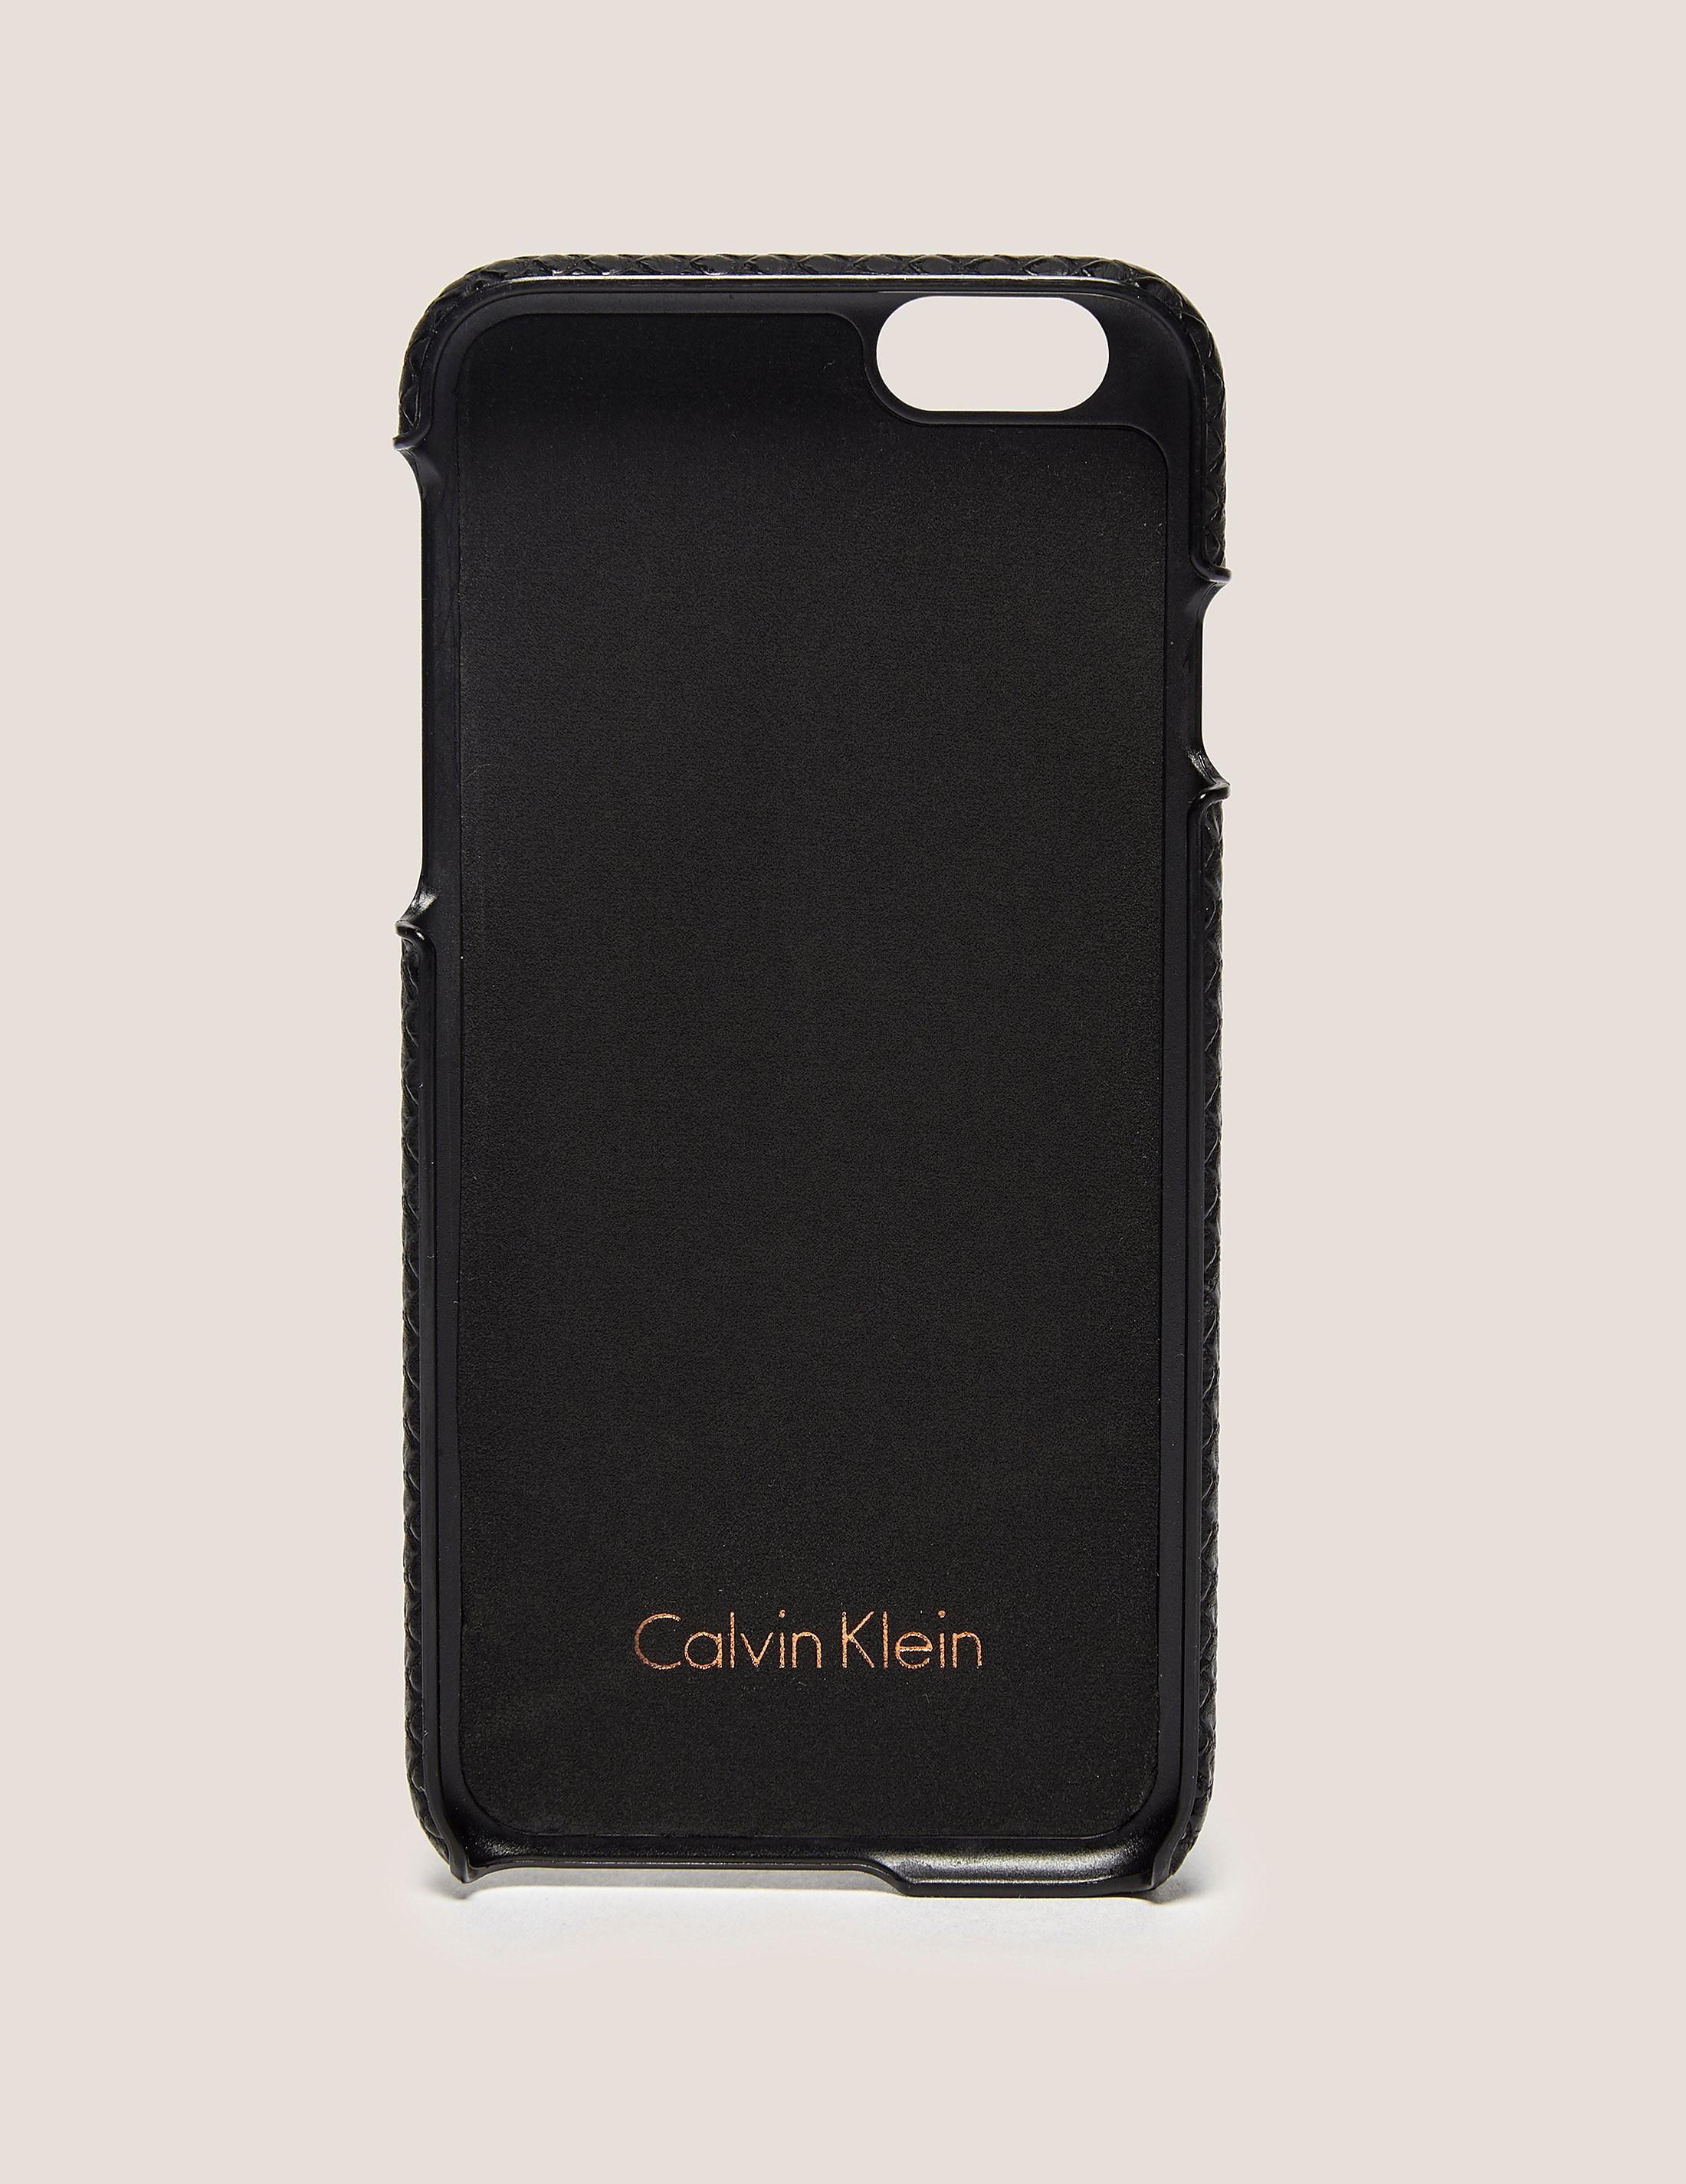 Calvin Klein Poppy iPhone 6S Cover